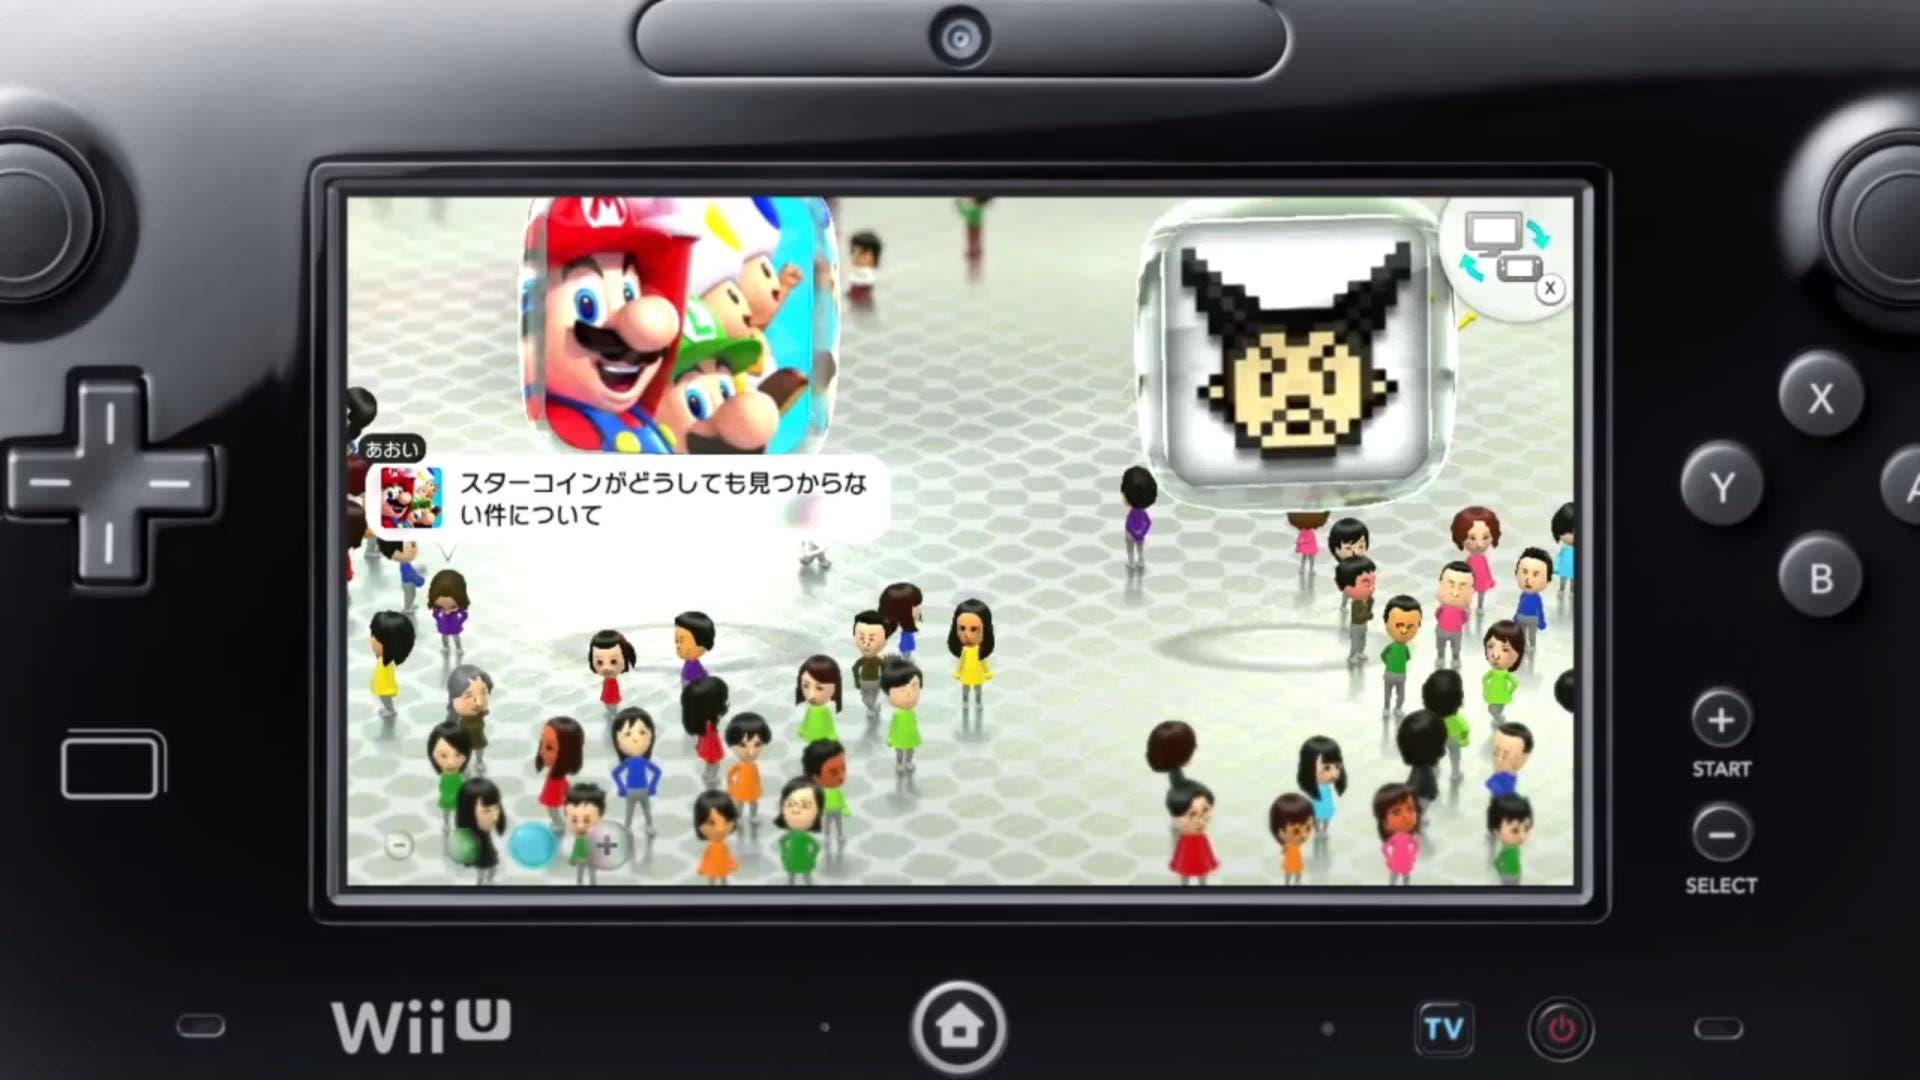 Nintendo baraja un sistema de transferencia de Wii U a Wii U